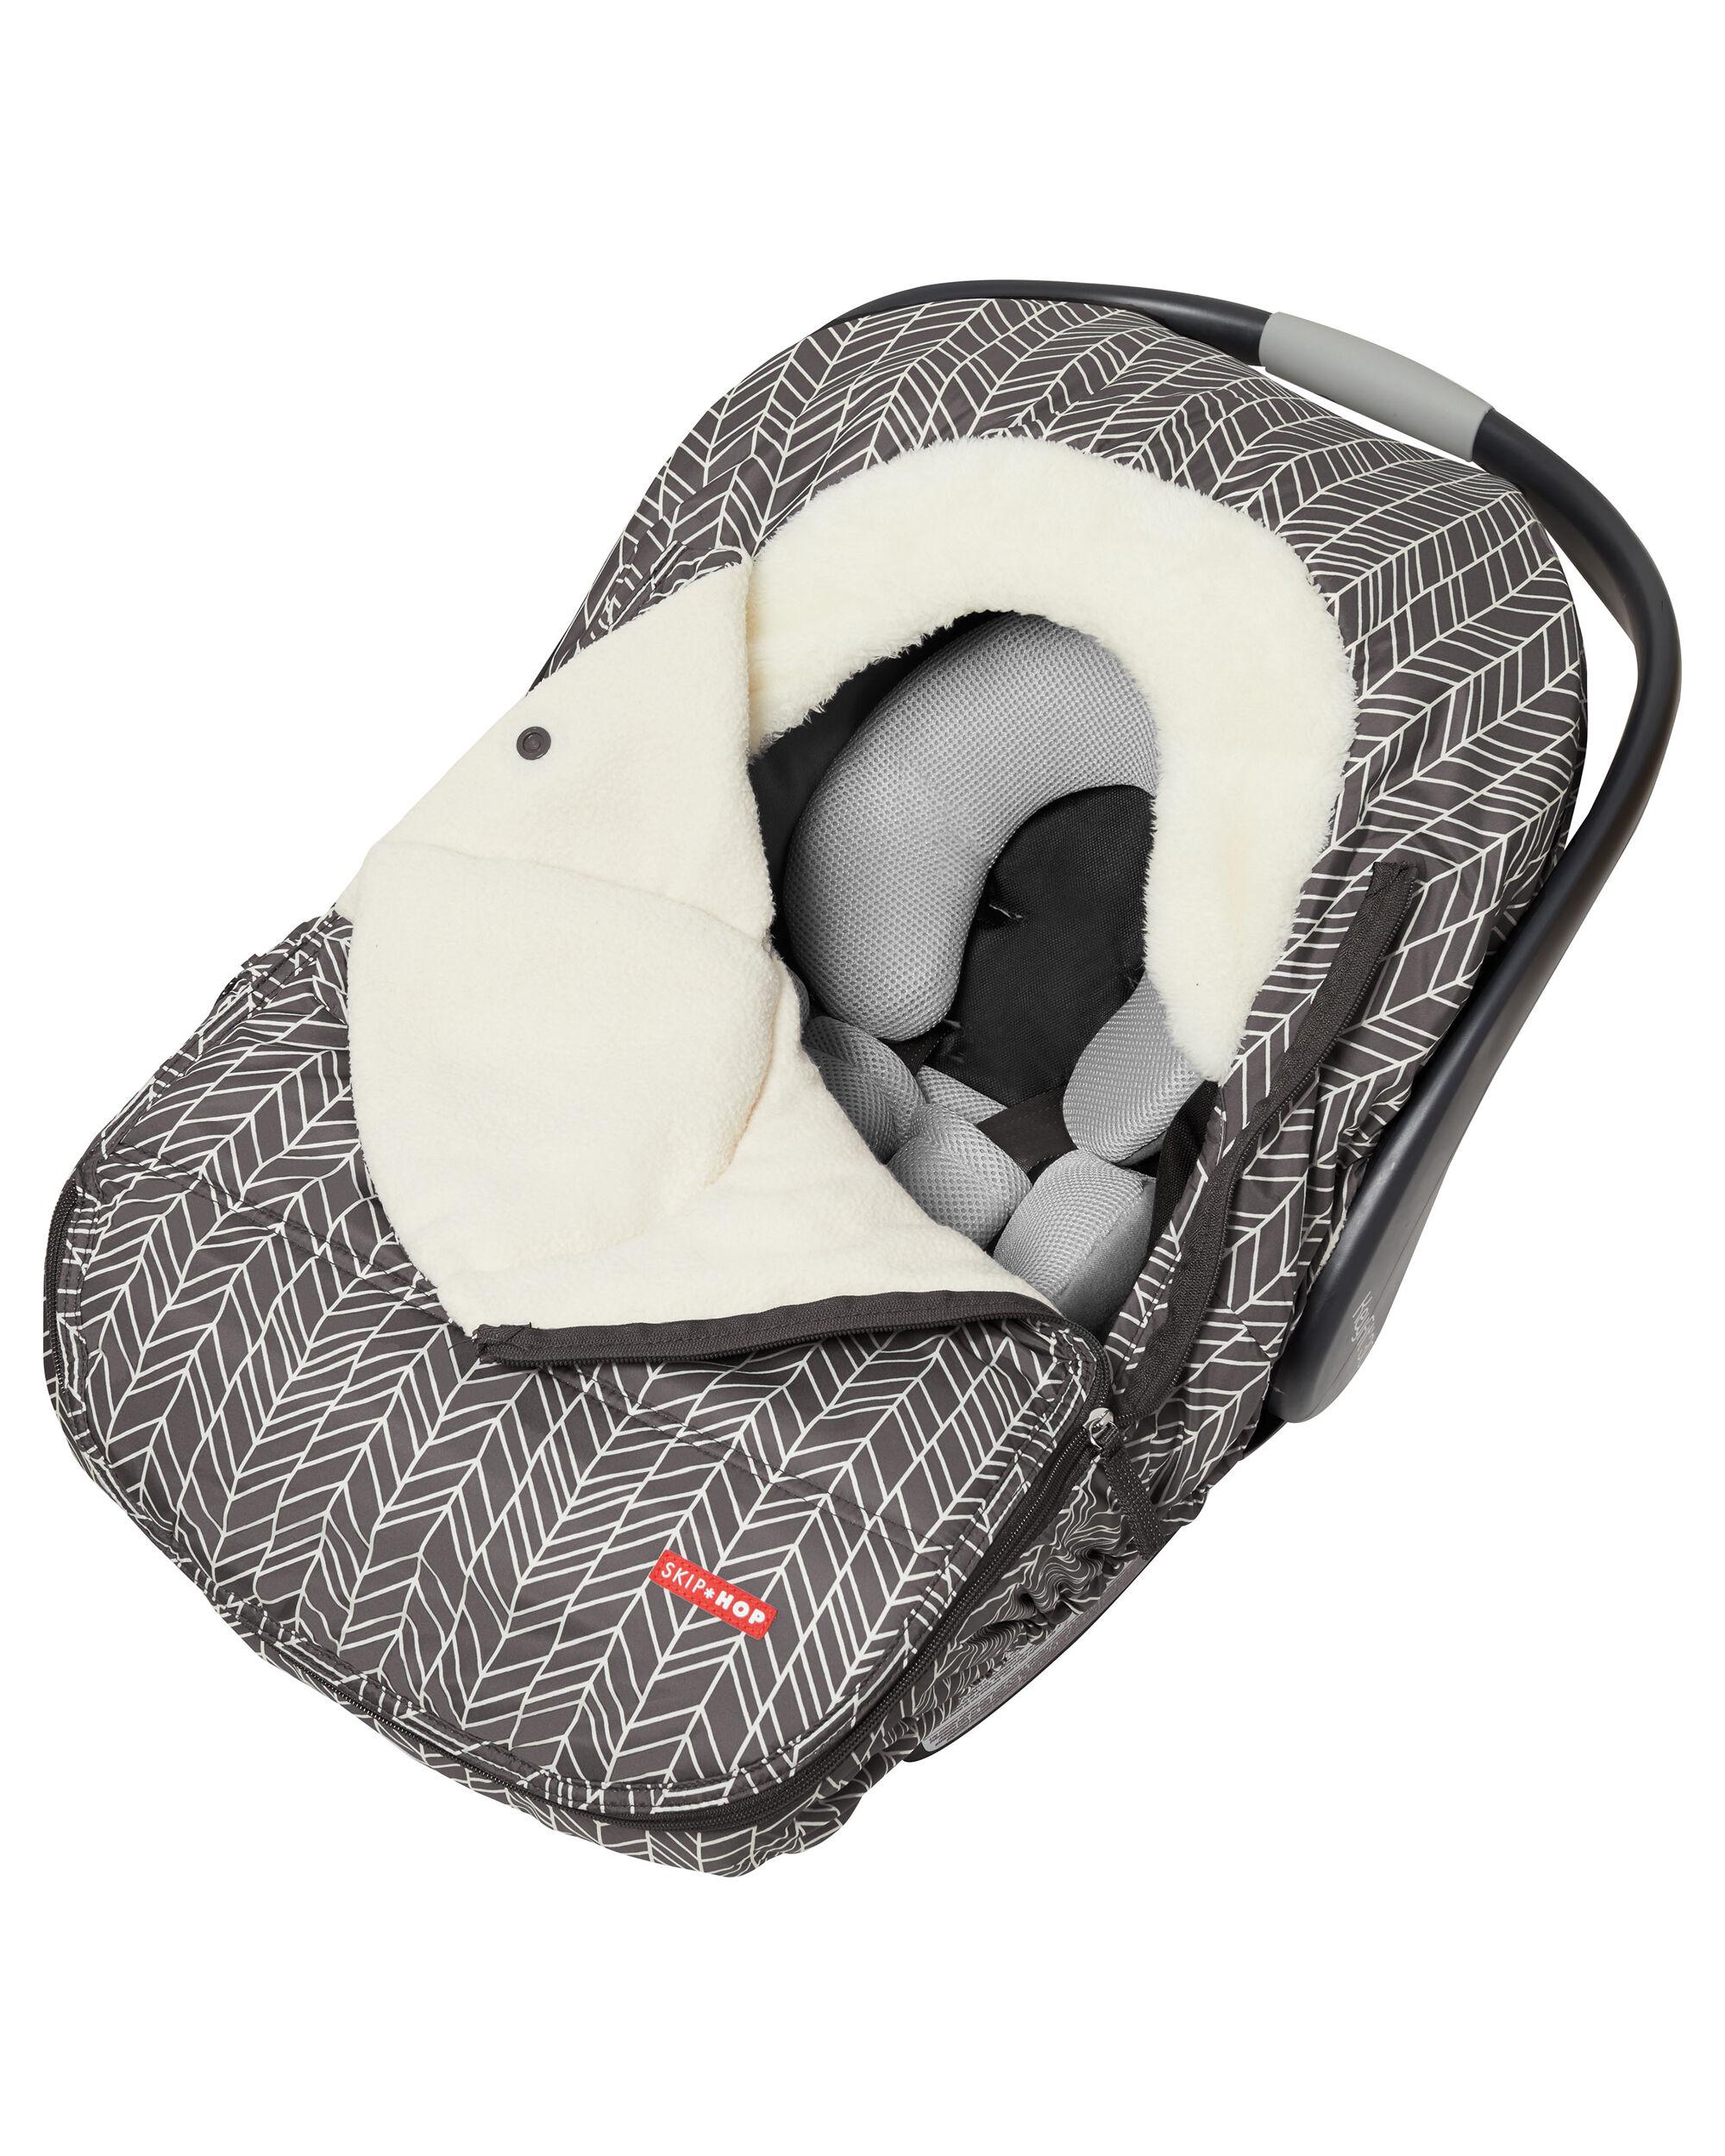 Stroll Amp Go Car Seat Cover Skiphop Com